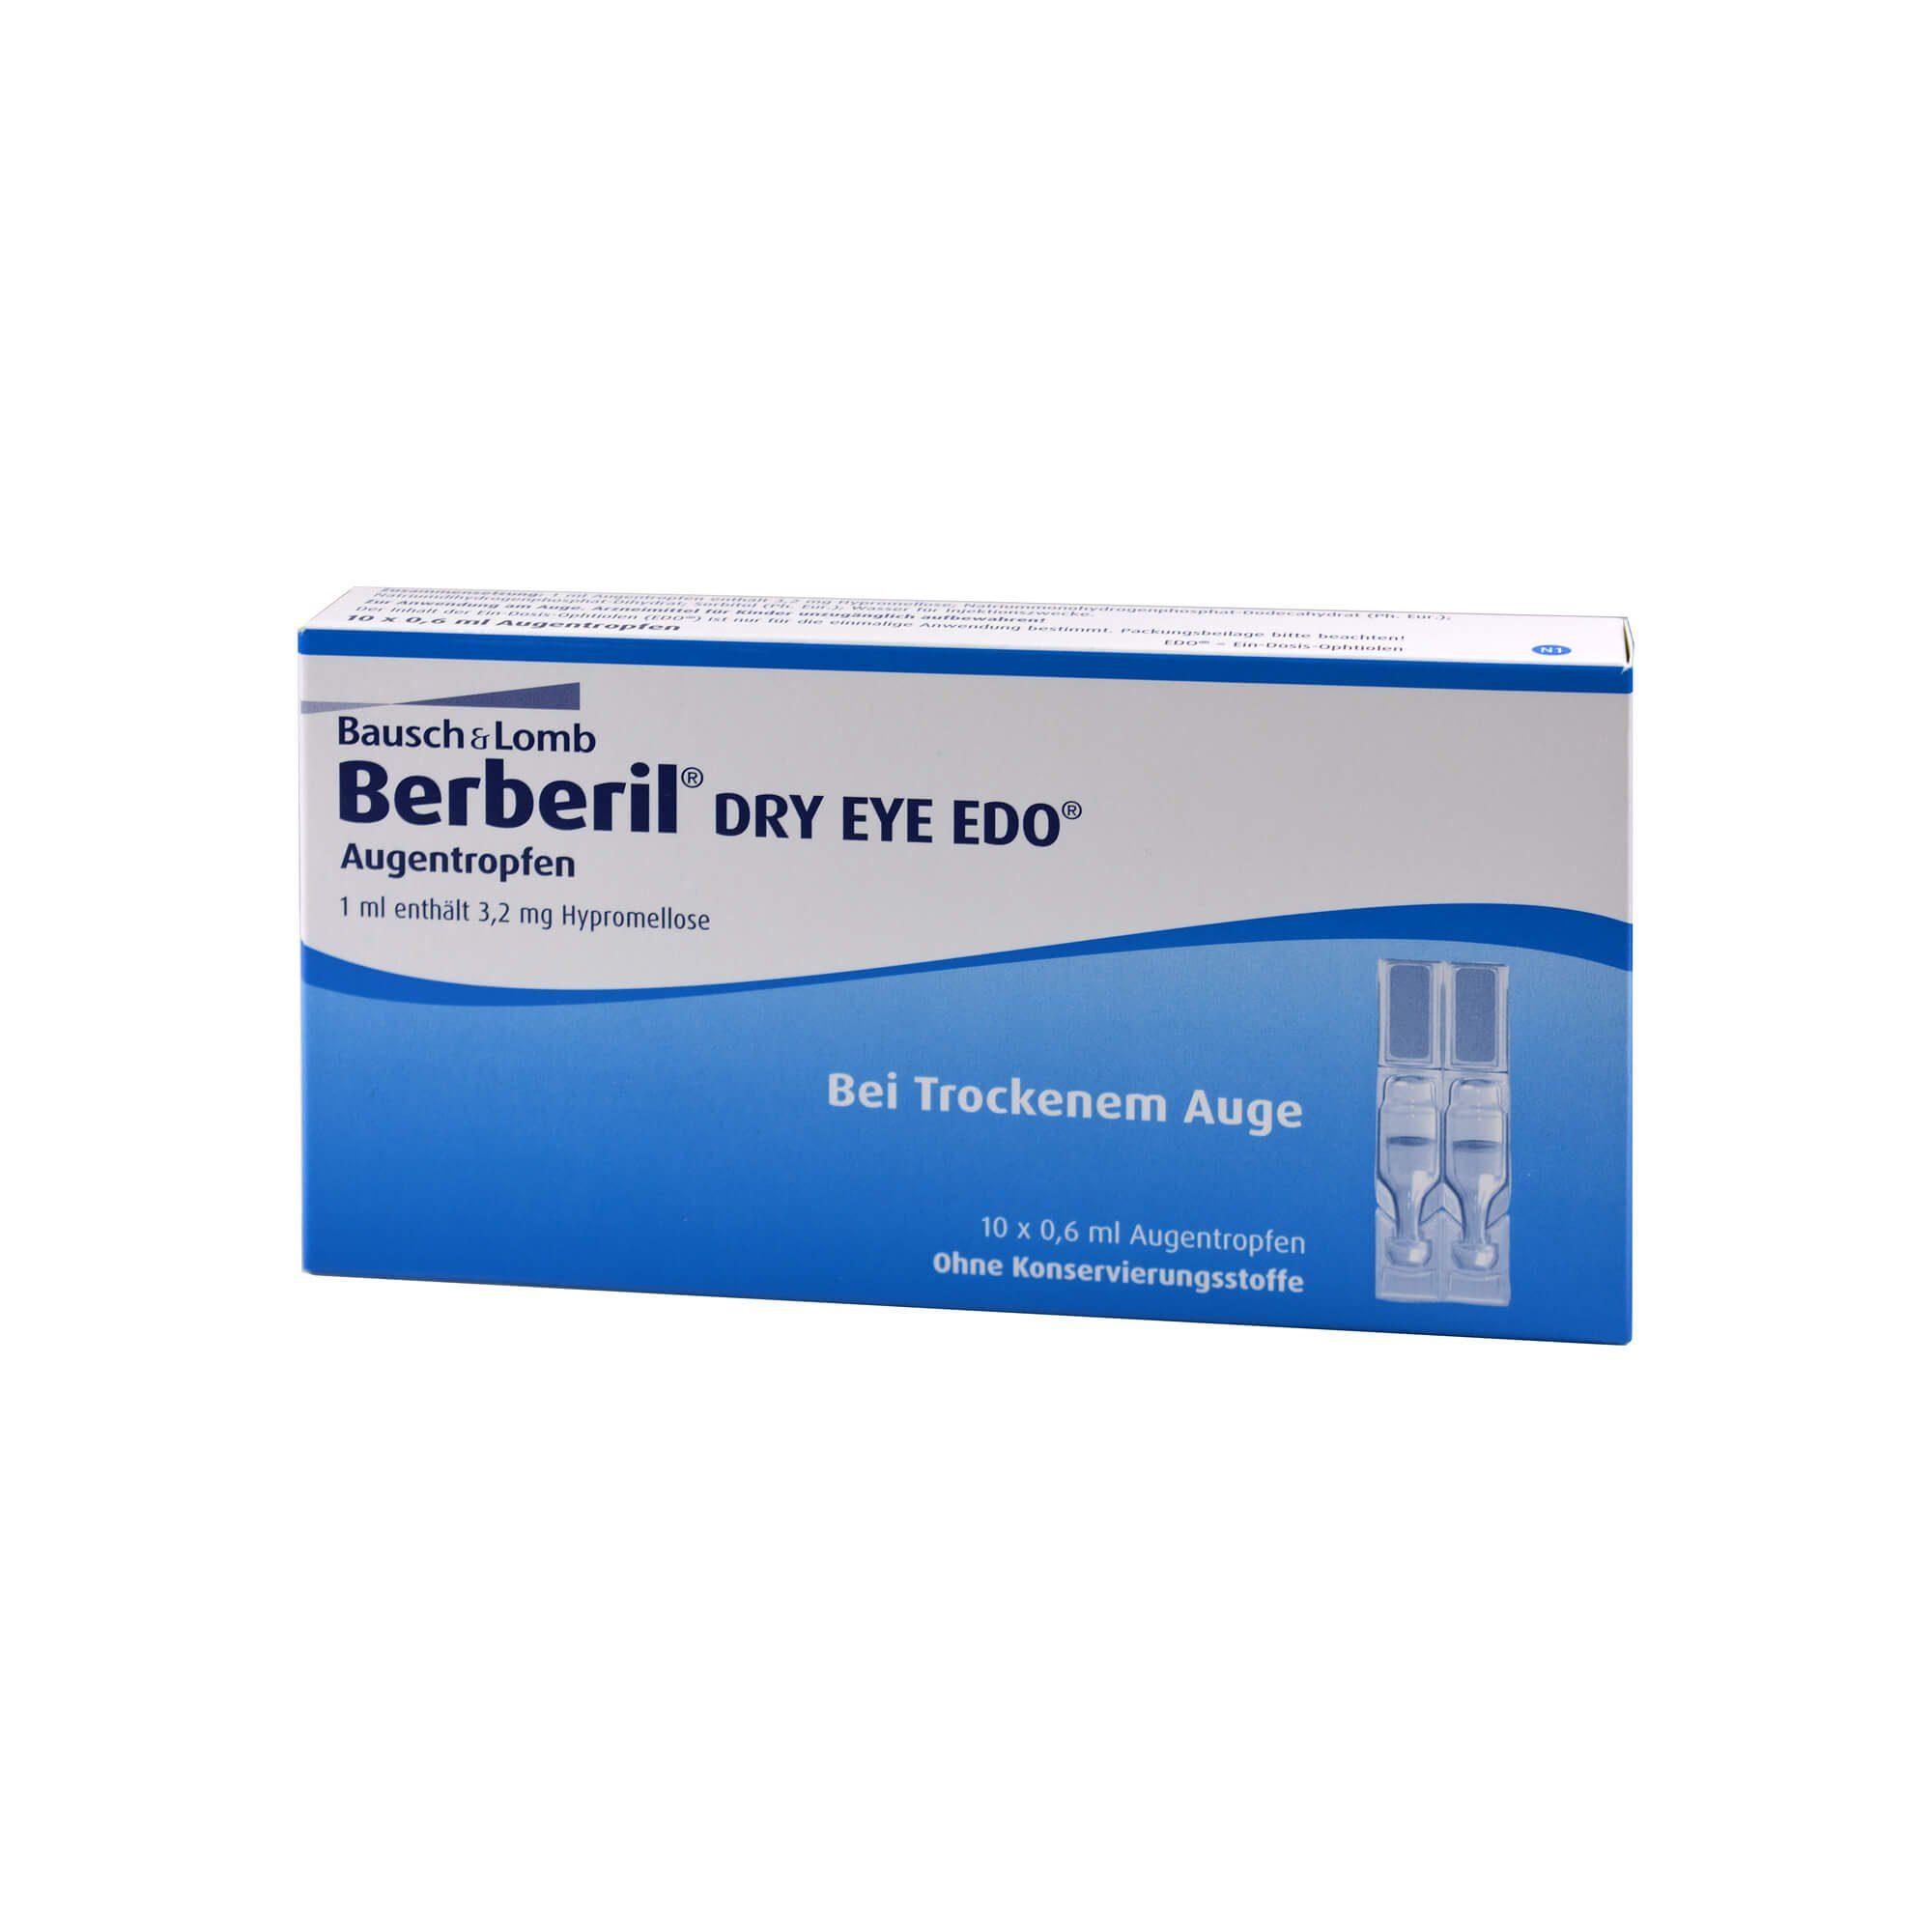 Berberil Dry Eye EDO, 10X0.6 ml